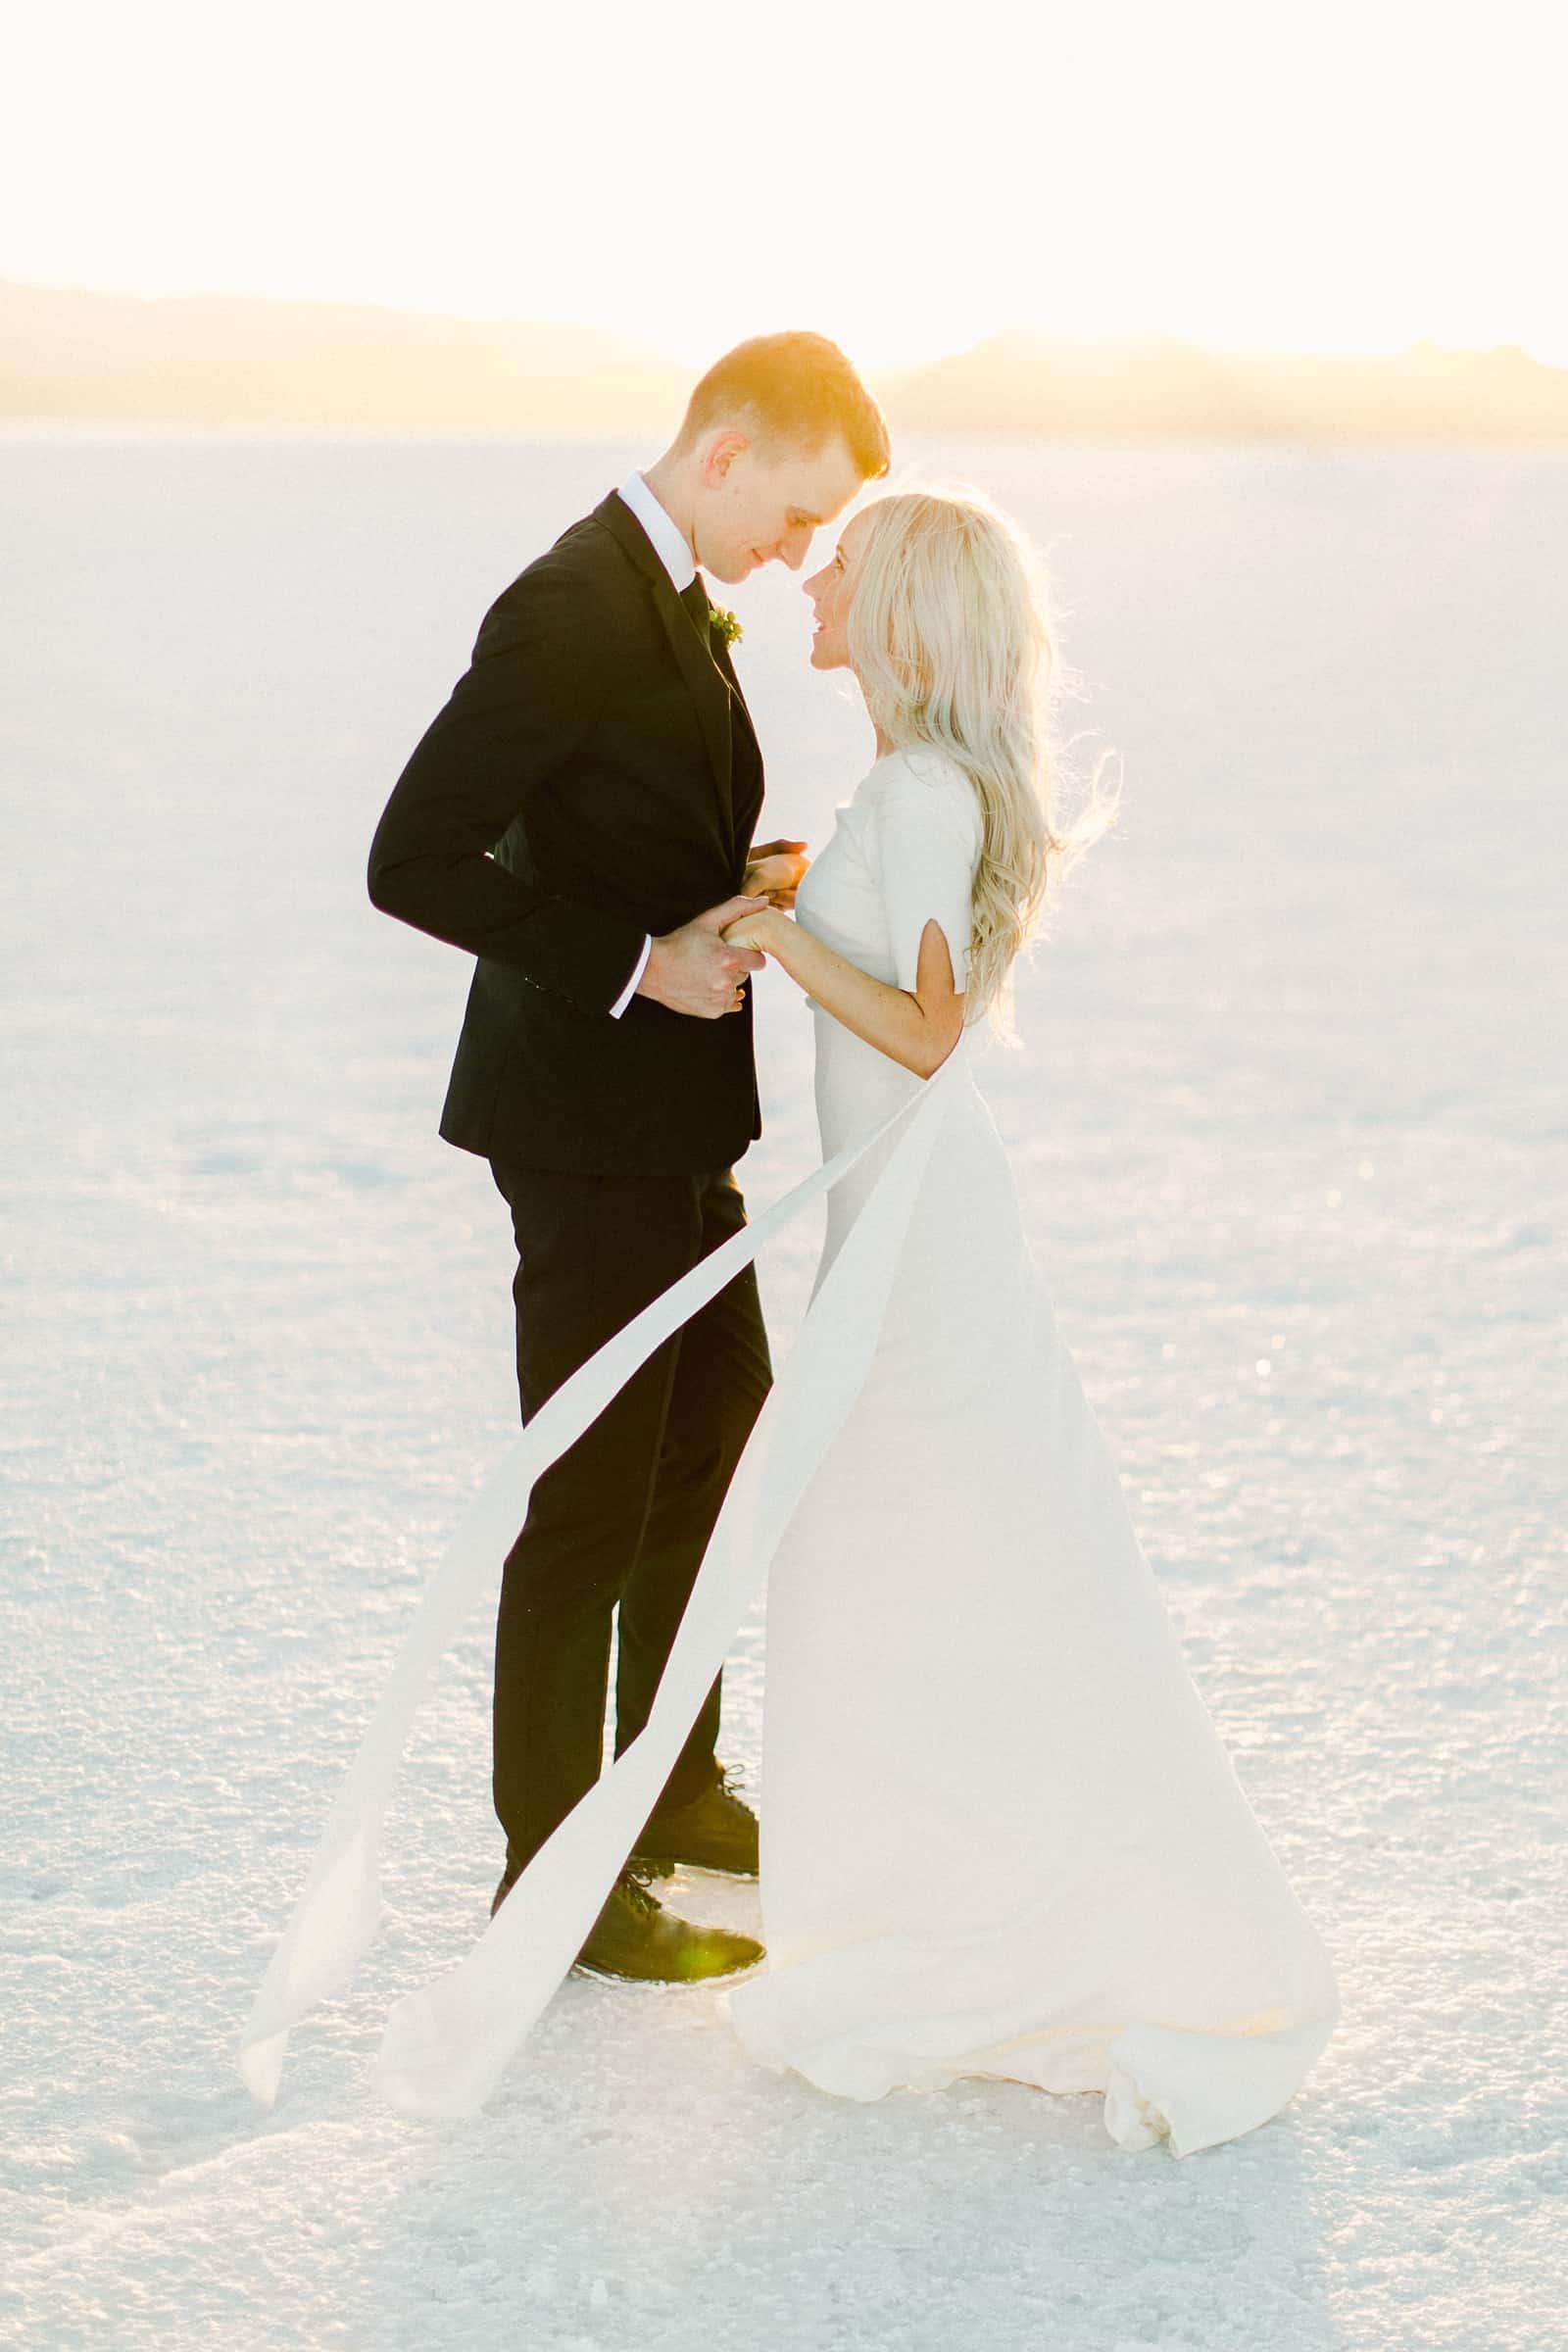 Bonneville Salt Flats Utah Wedding Photography, destination wedding, modern bride and groom golden light